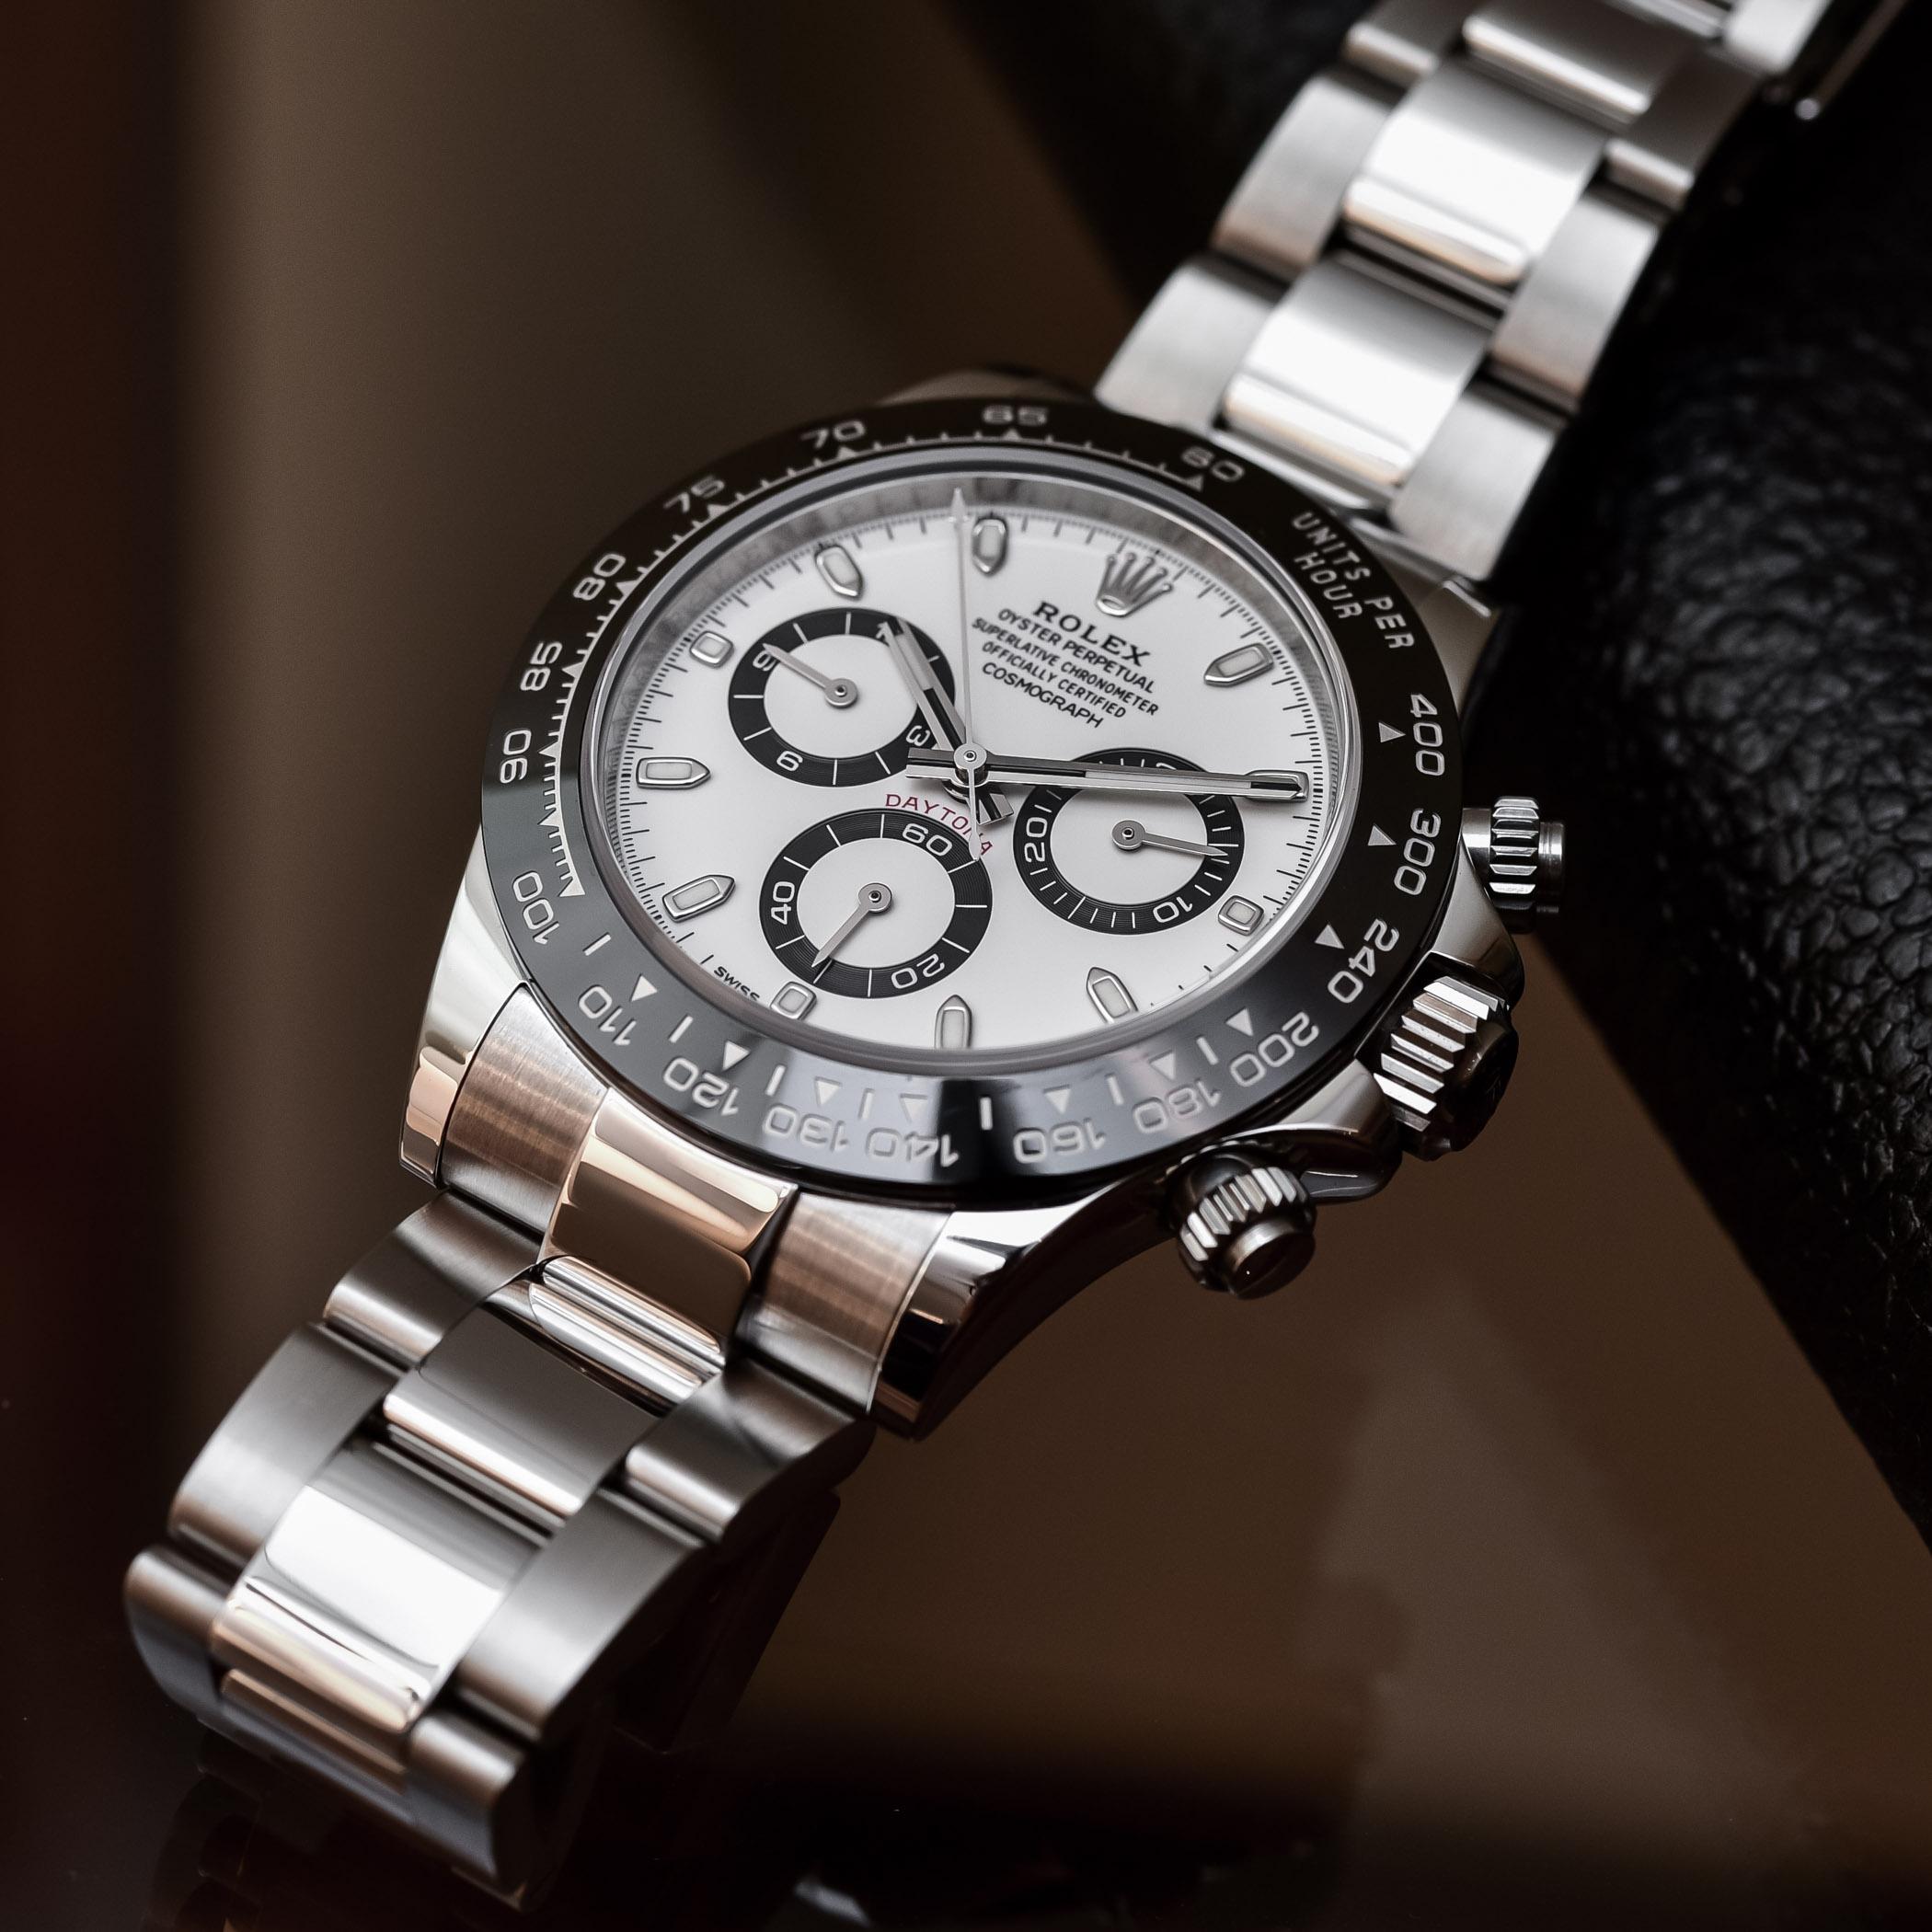 Rolex Daytona 116500LN Market analysis - continuous and insane rise price - 1